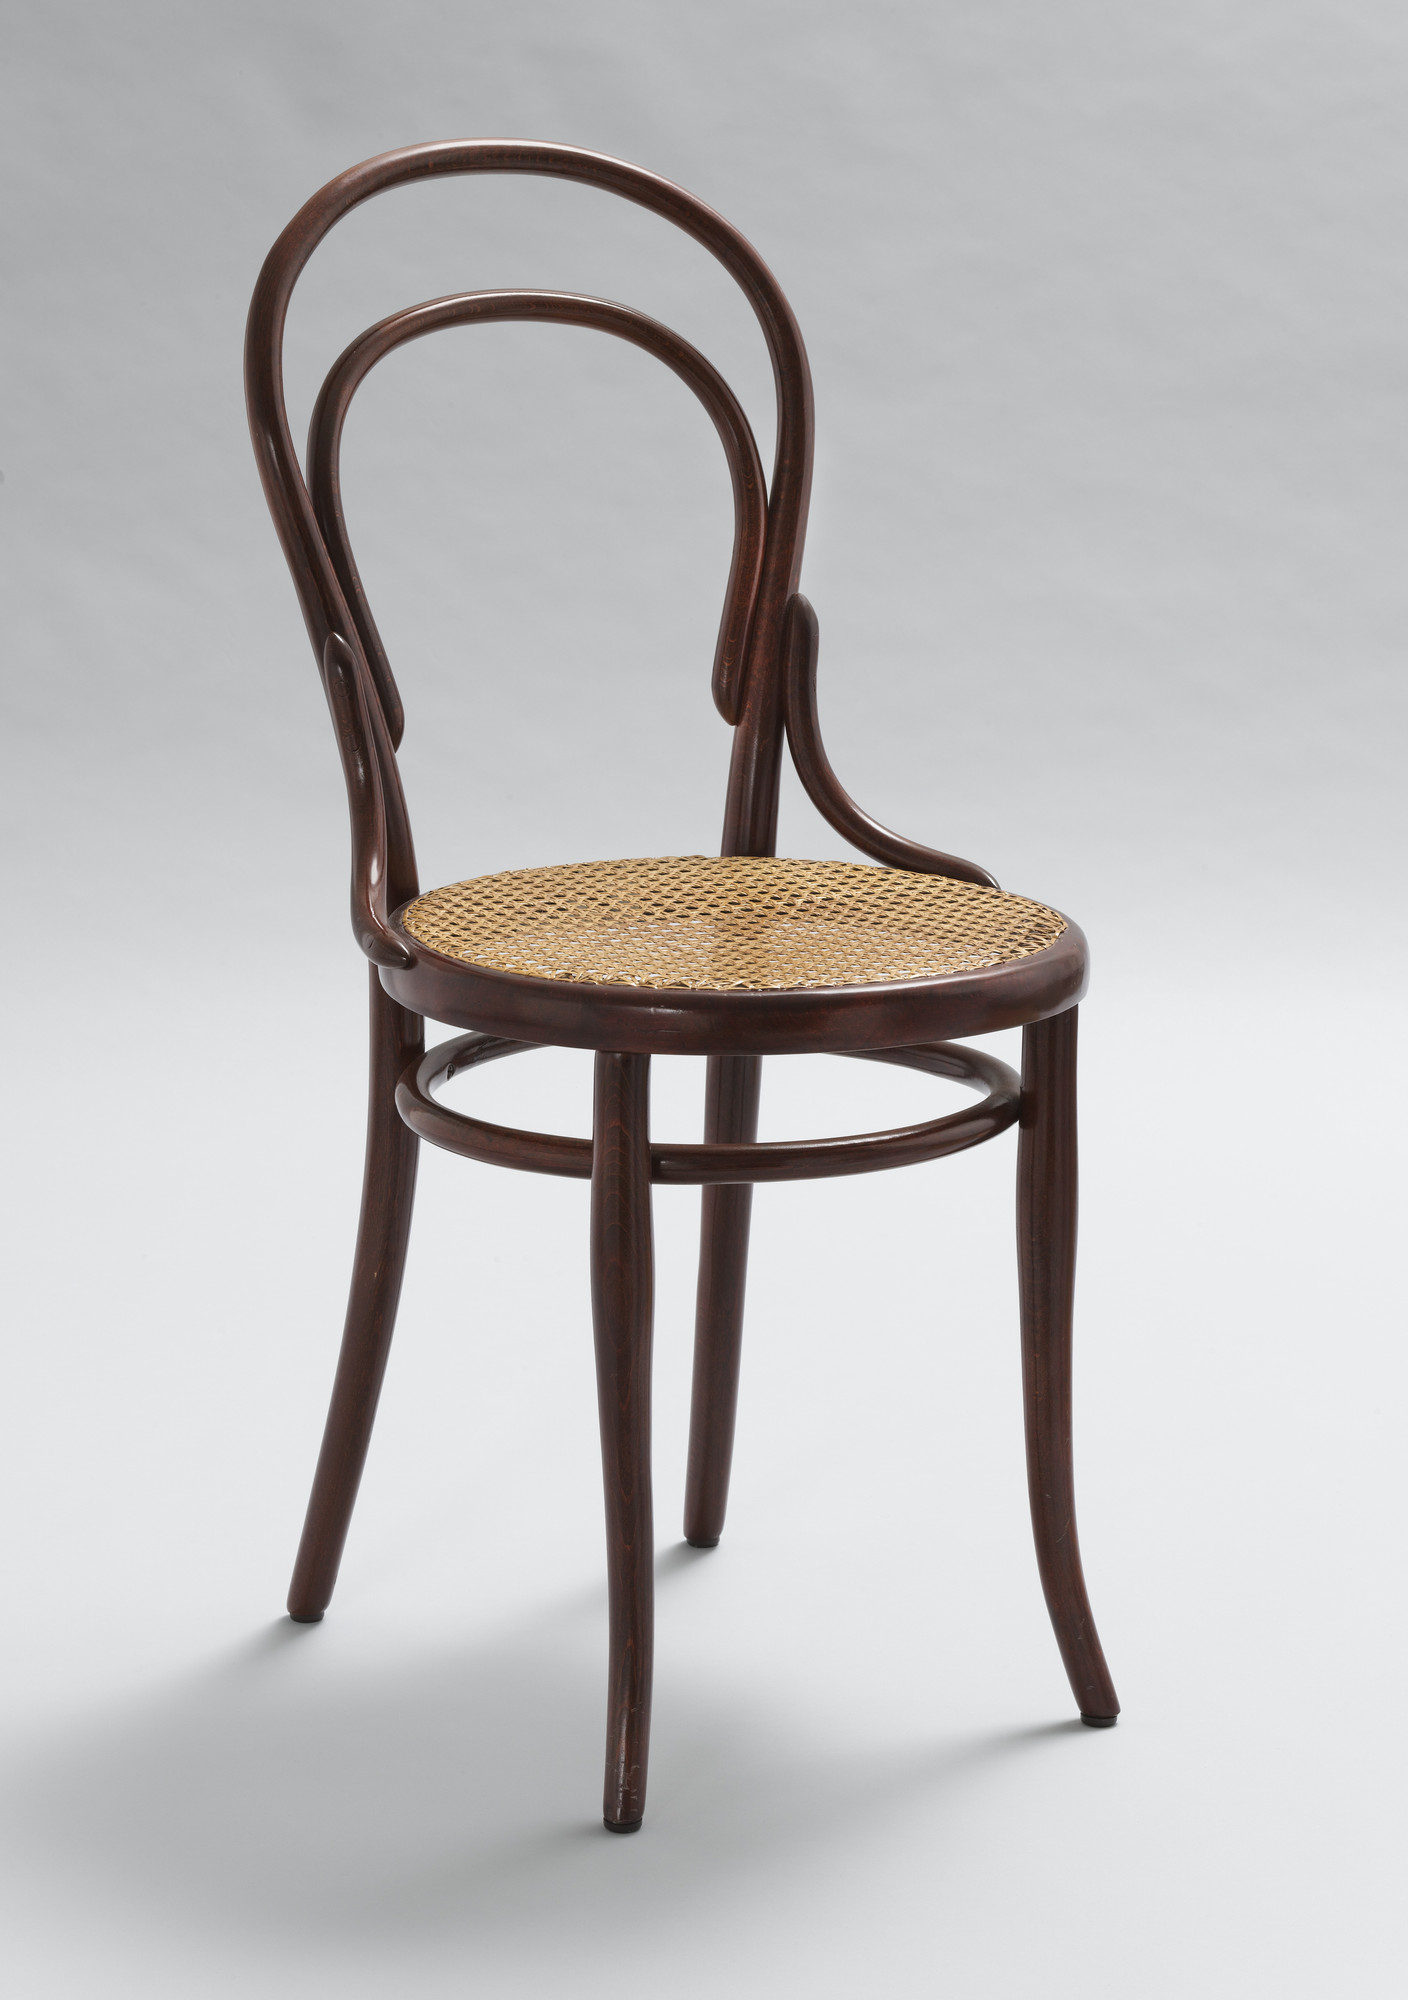 Michael Thonet Chair No 14 1881 Moma